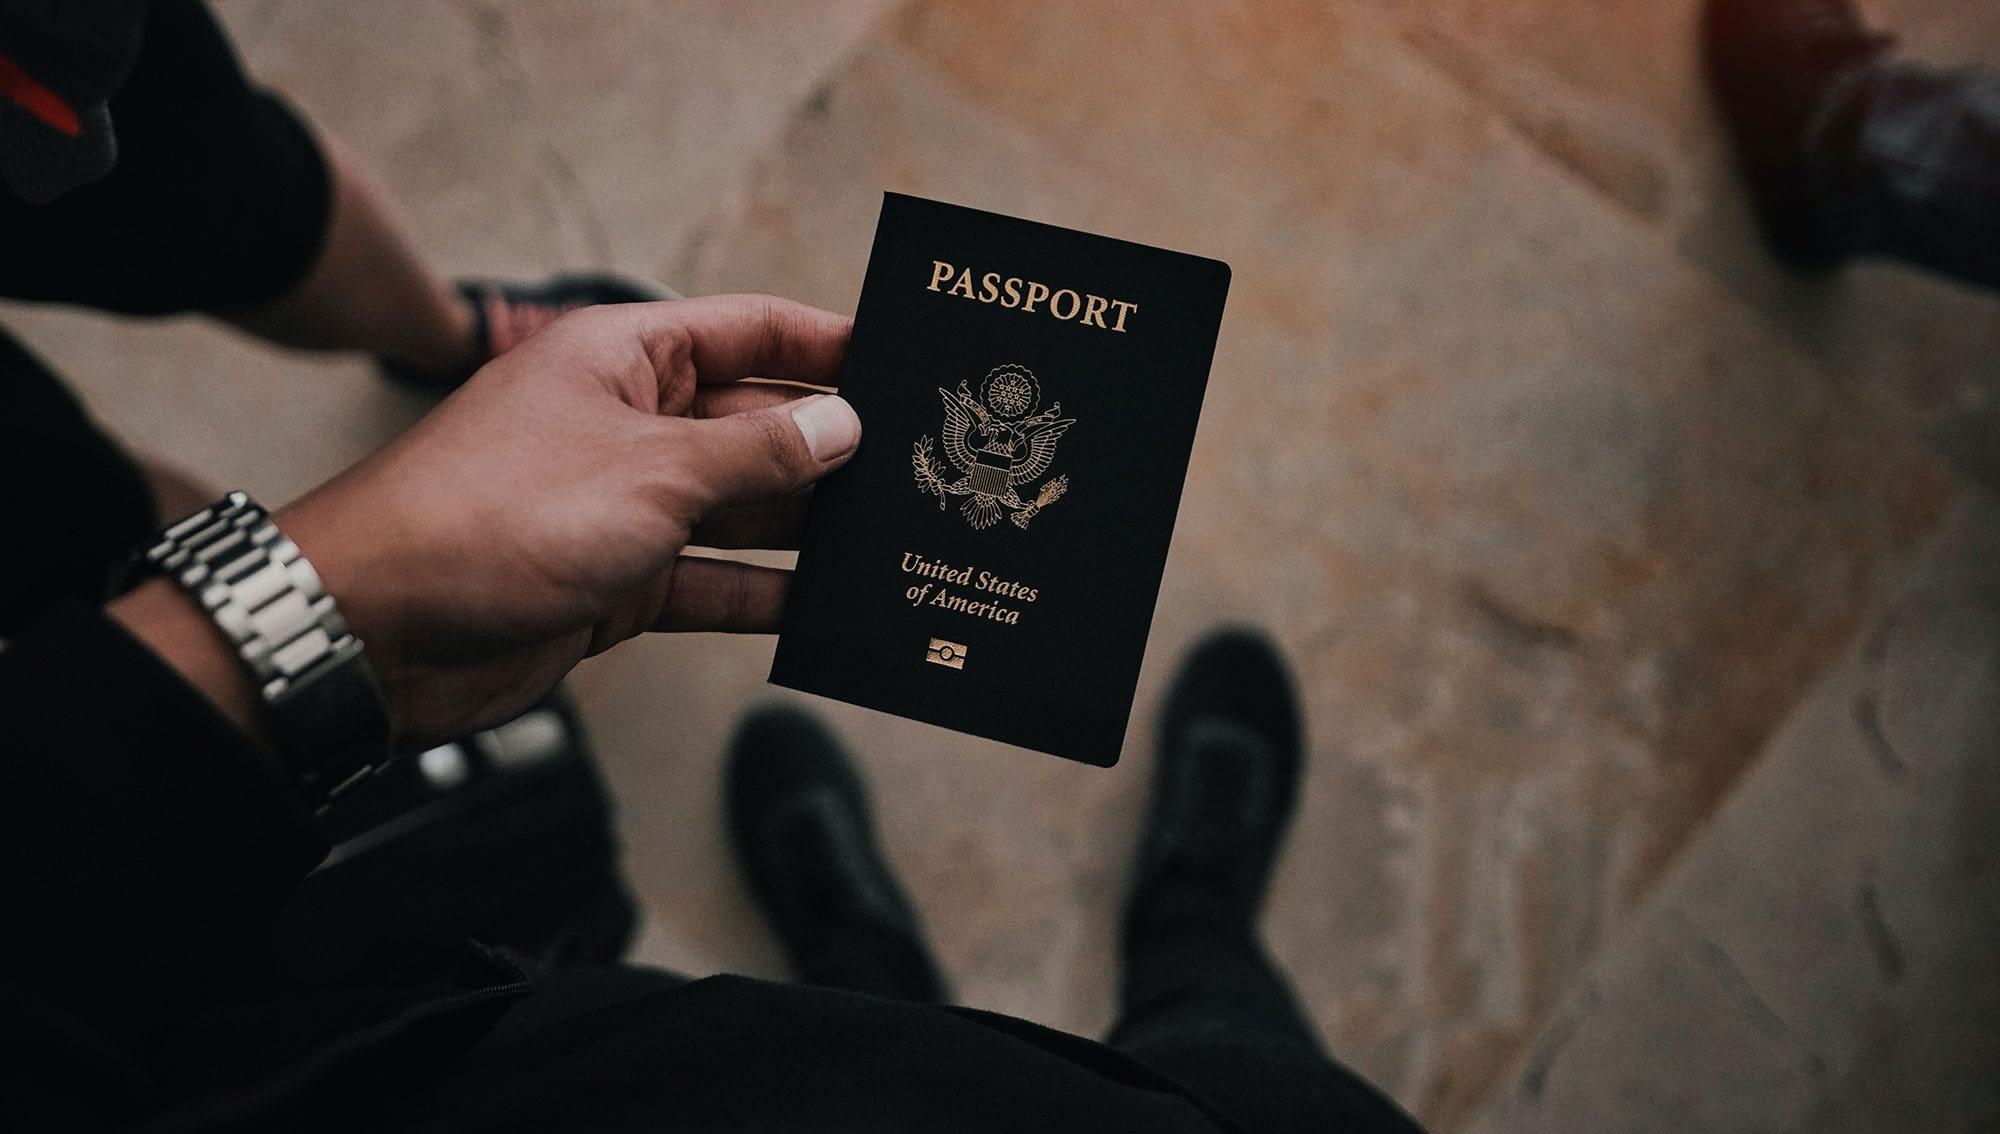 how much do passport photos cost?